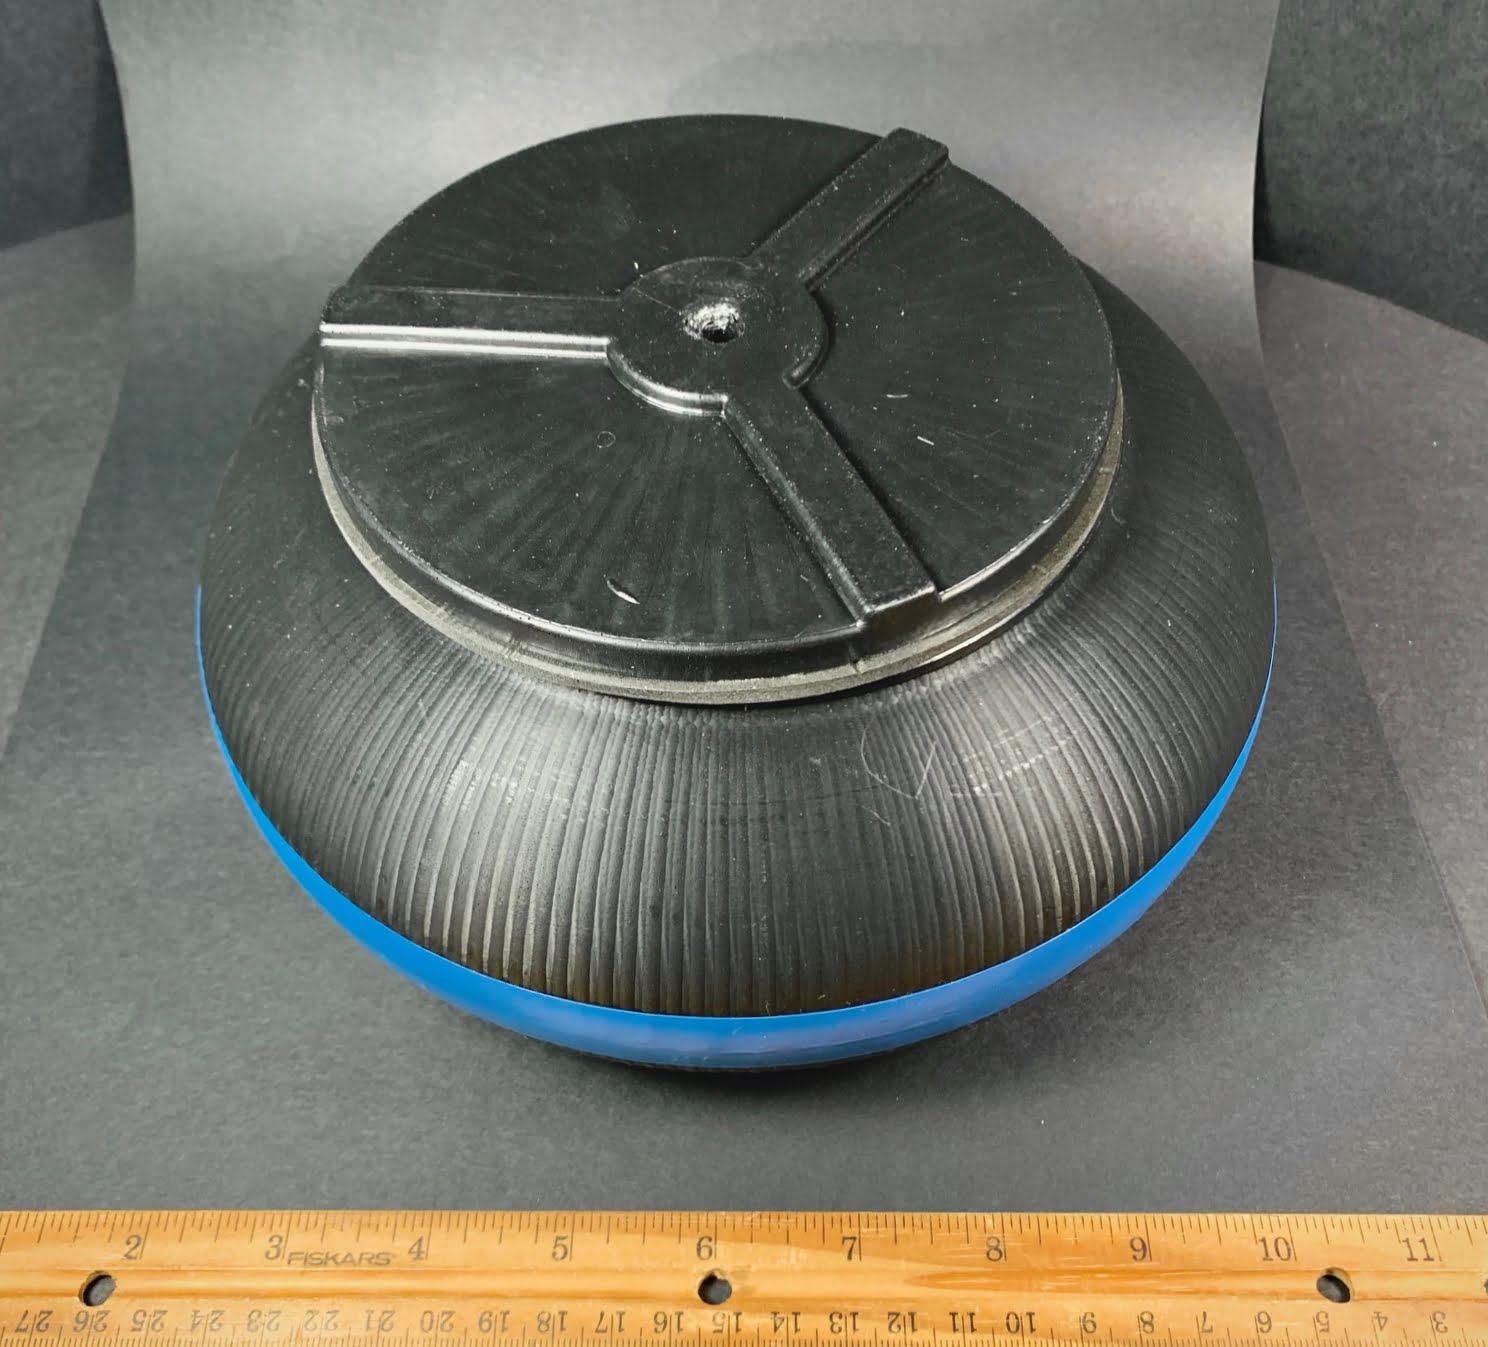 UV10MB 3.5 lb. Bowl